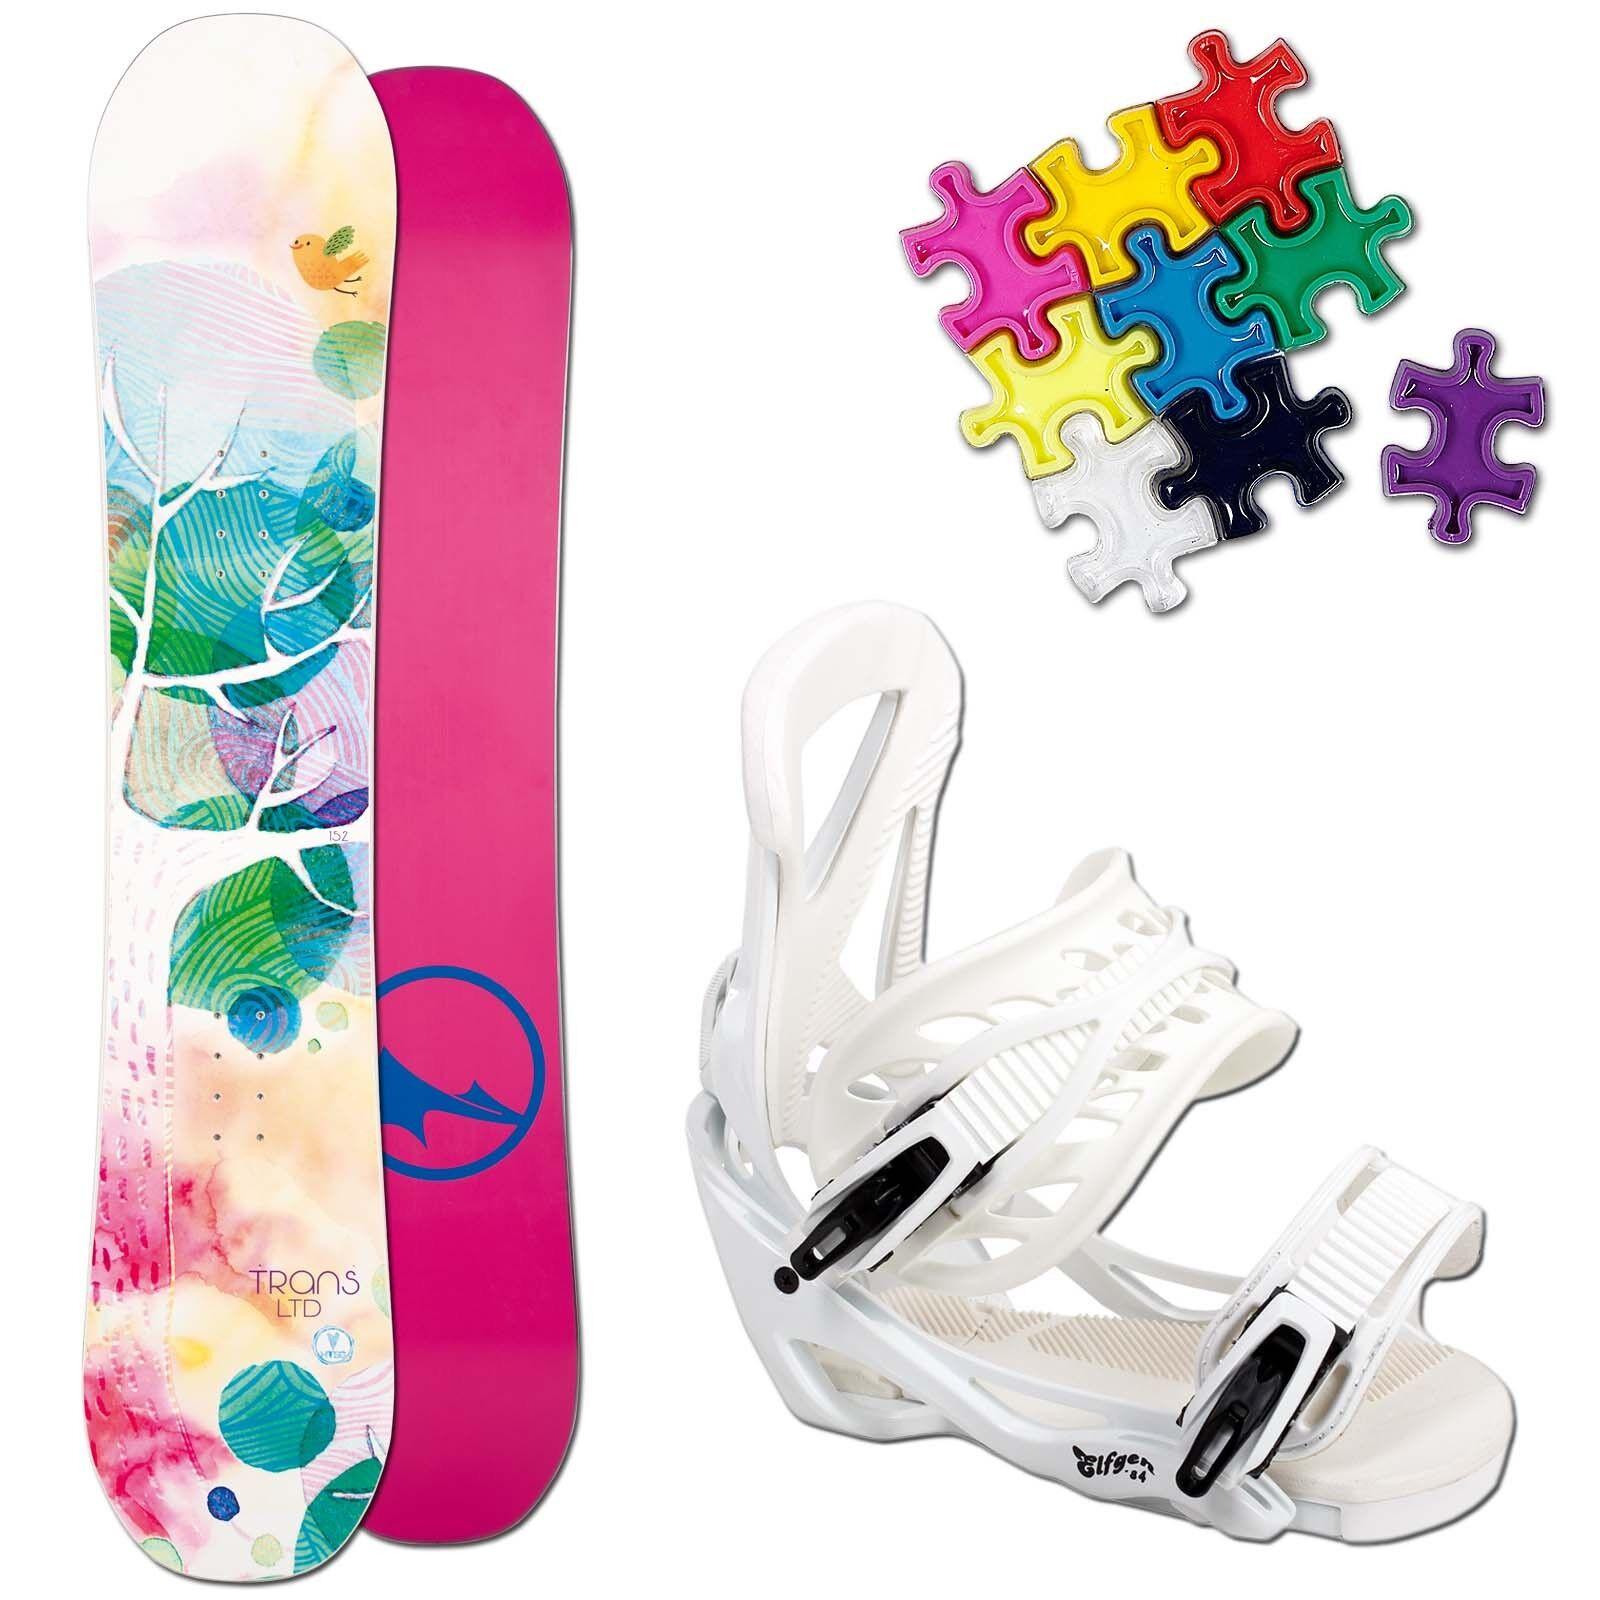 Trans Ltd Women's Snowboard Set - 152 Cm + Elfgen Team Binding SIZE M + Pad